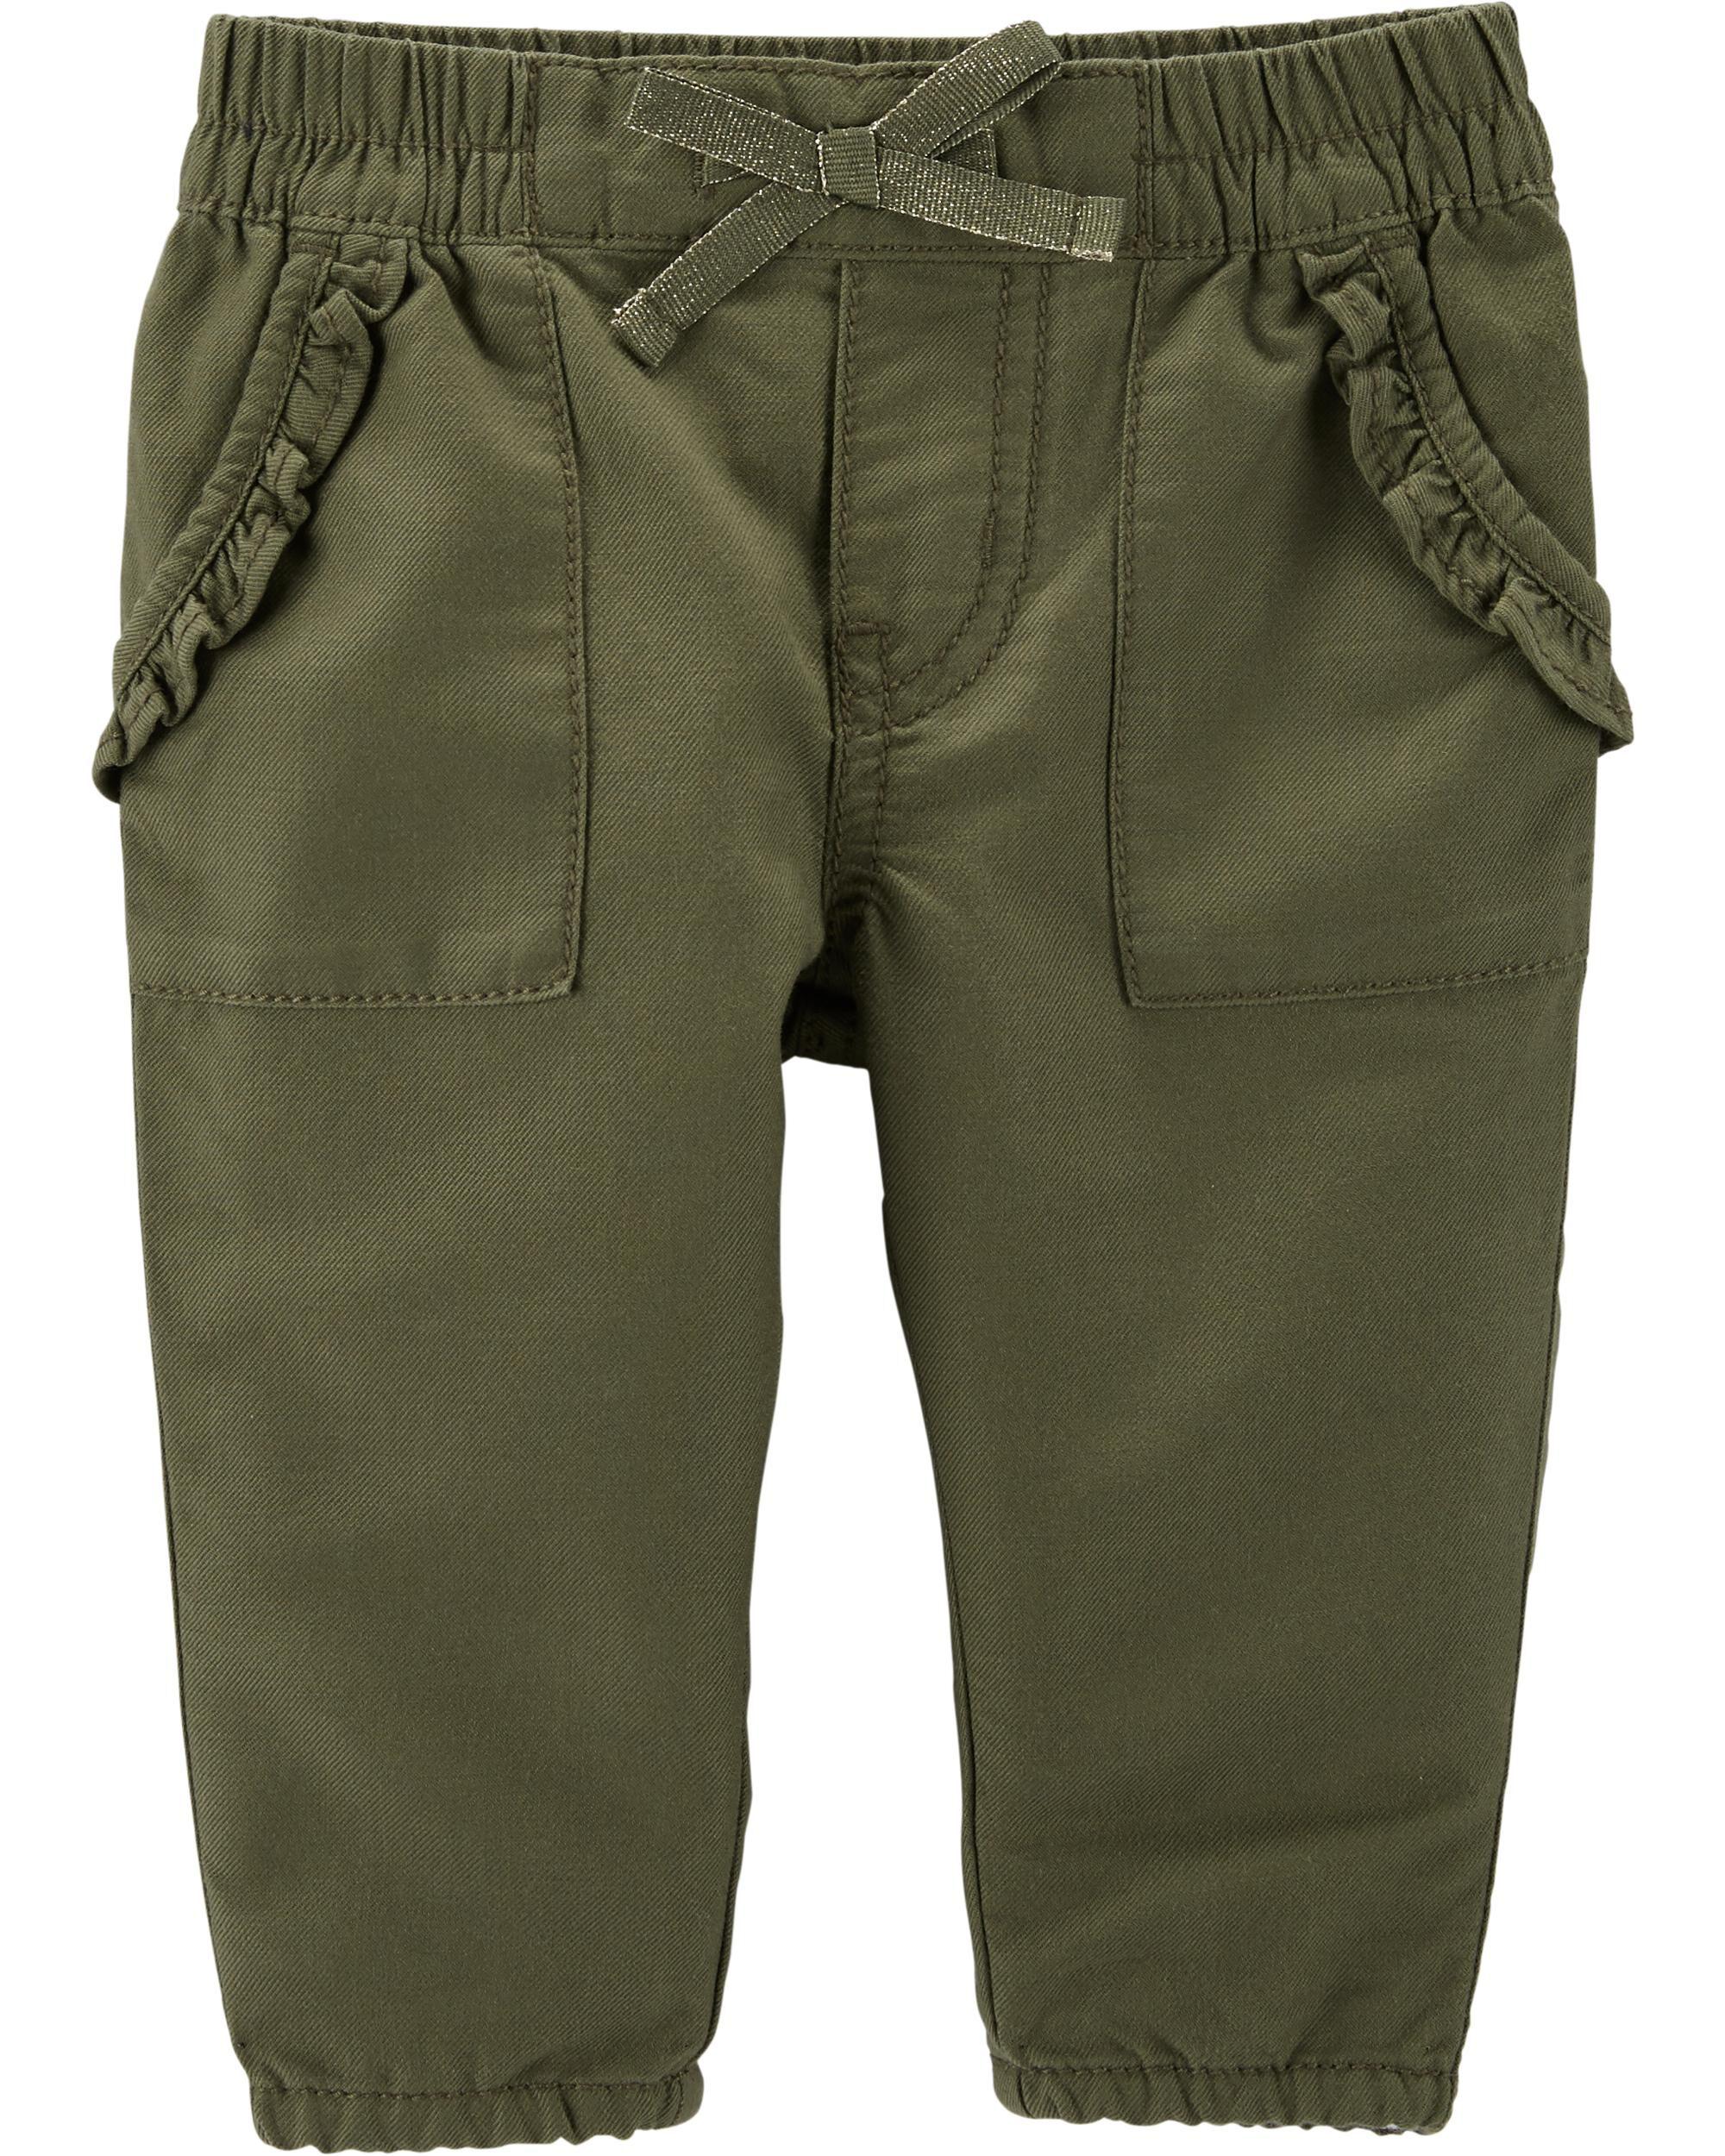 OshKosh Bgosh Baby Girls Pull-On Twill Shorts